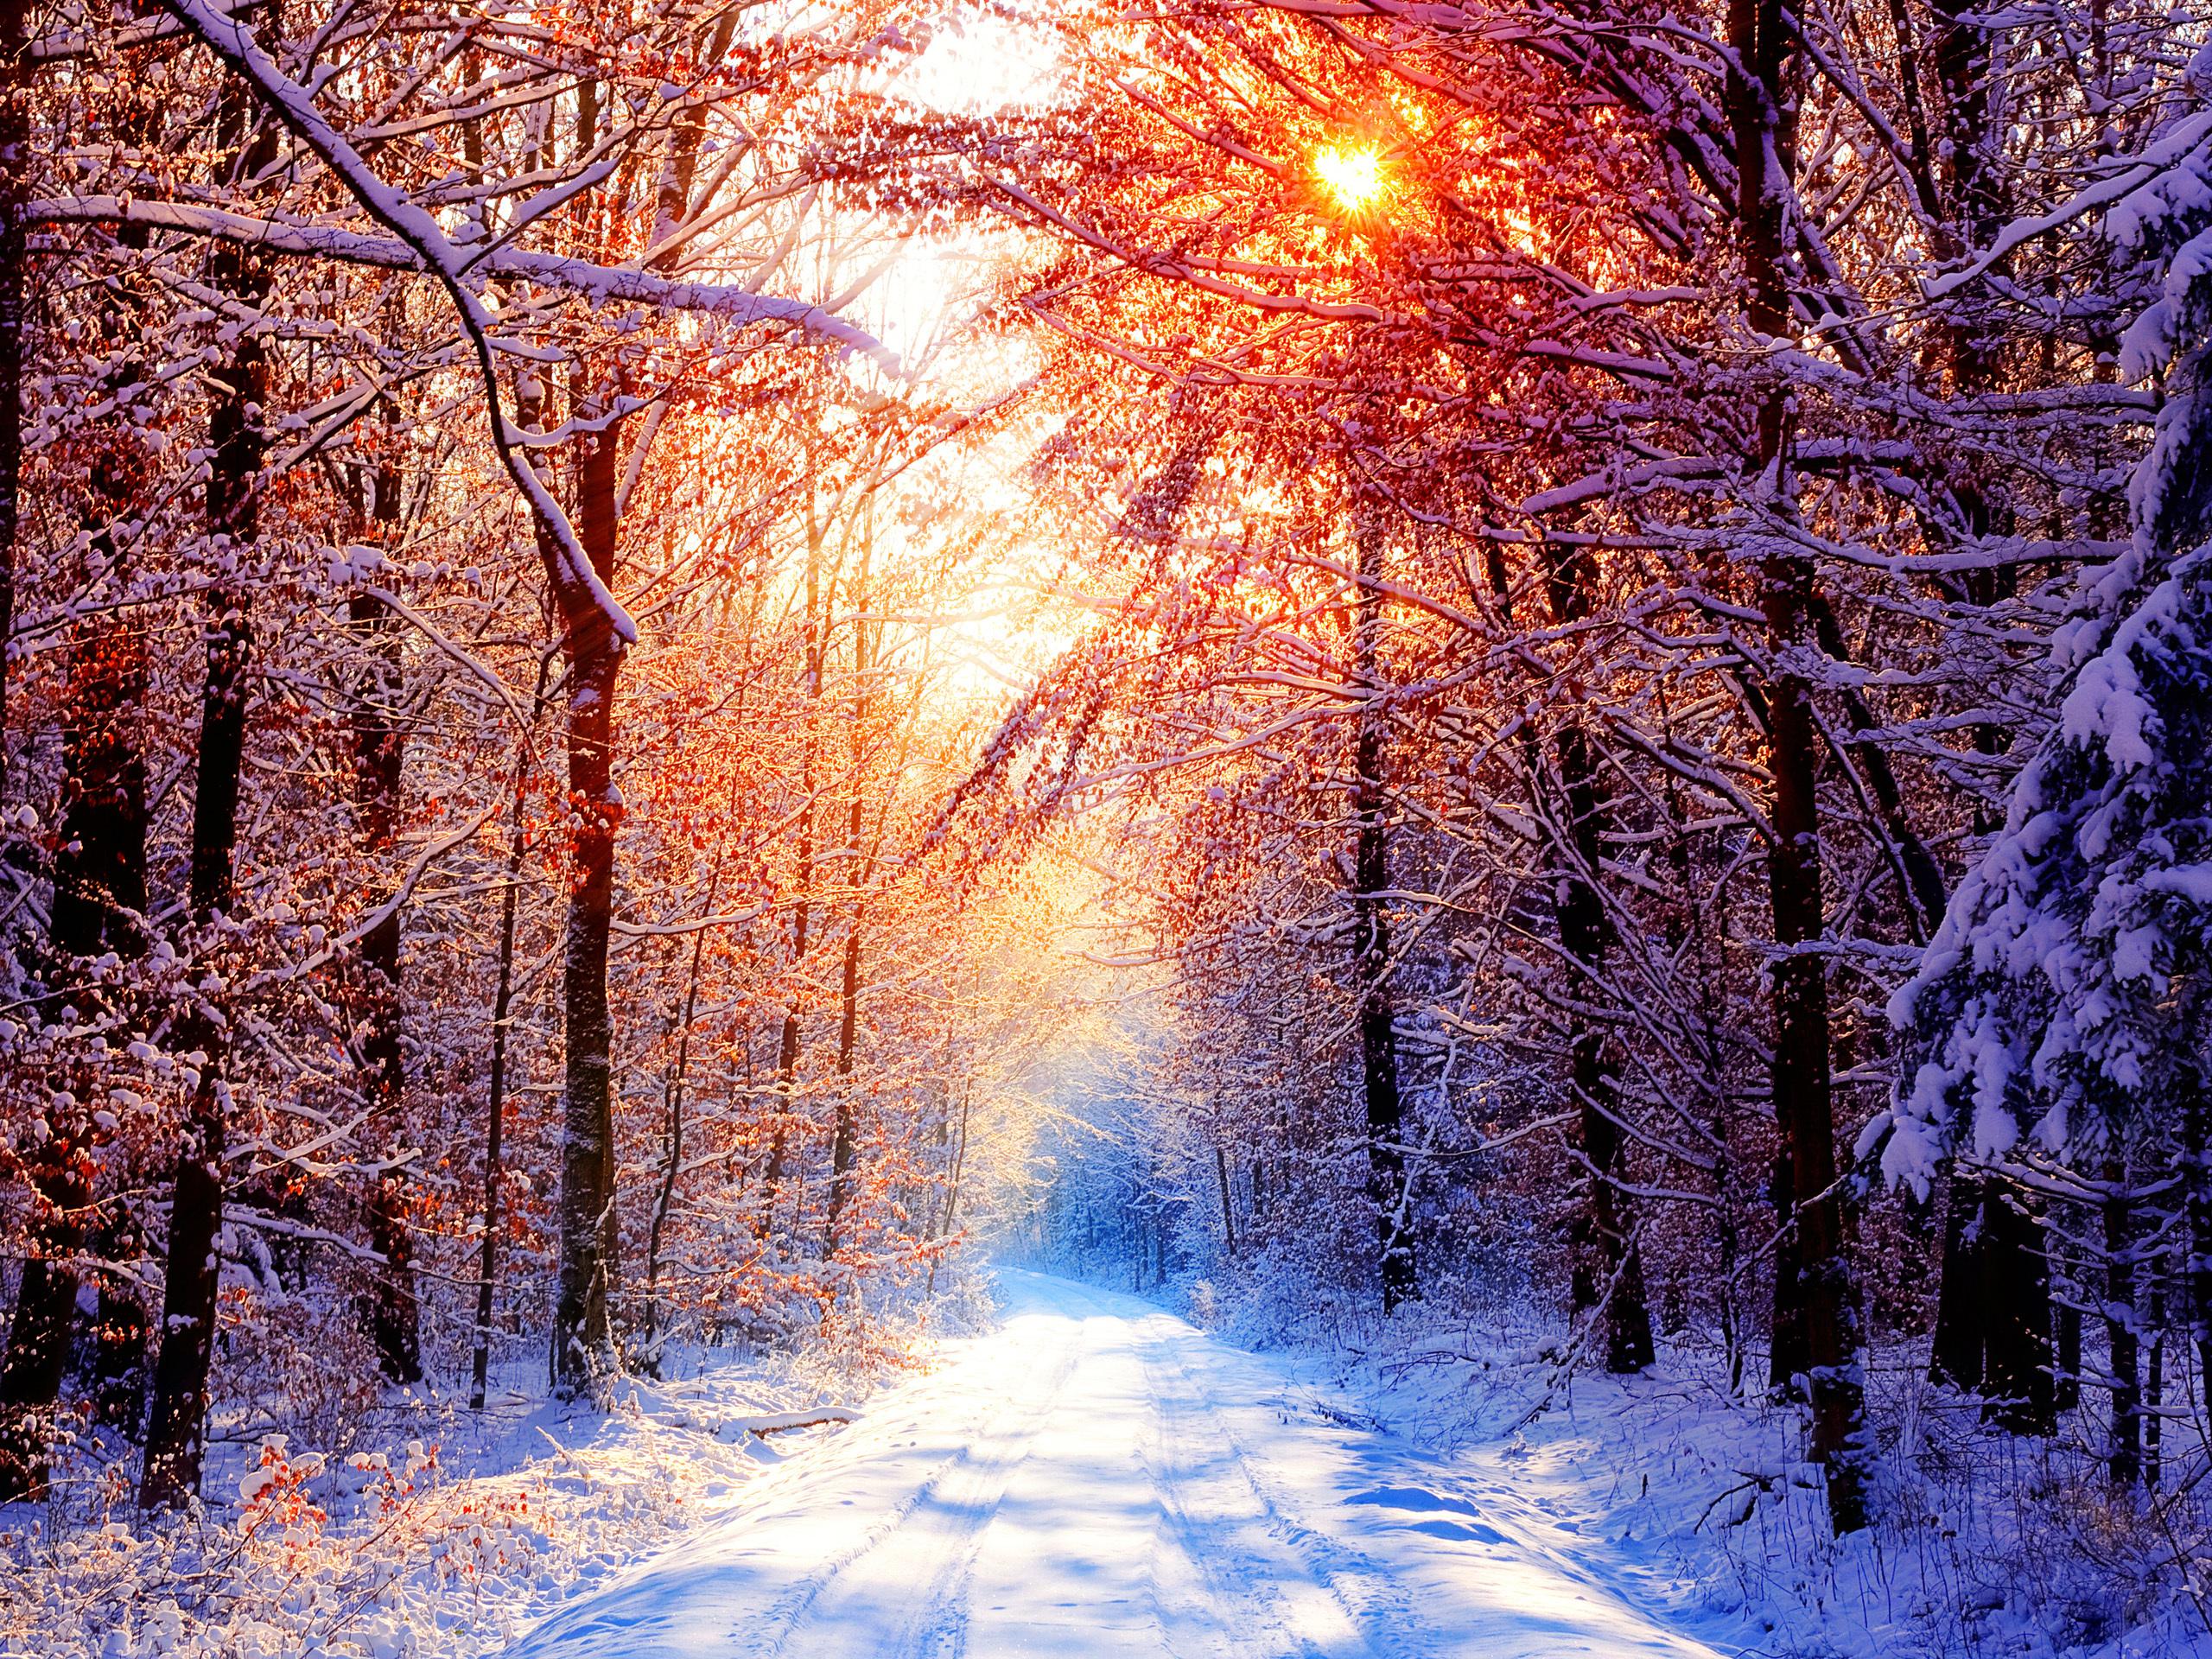 Зимний лес картинки сохранить, добрым утром